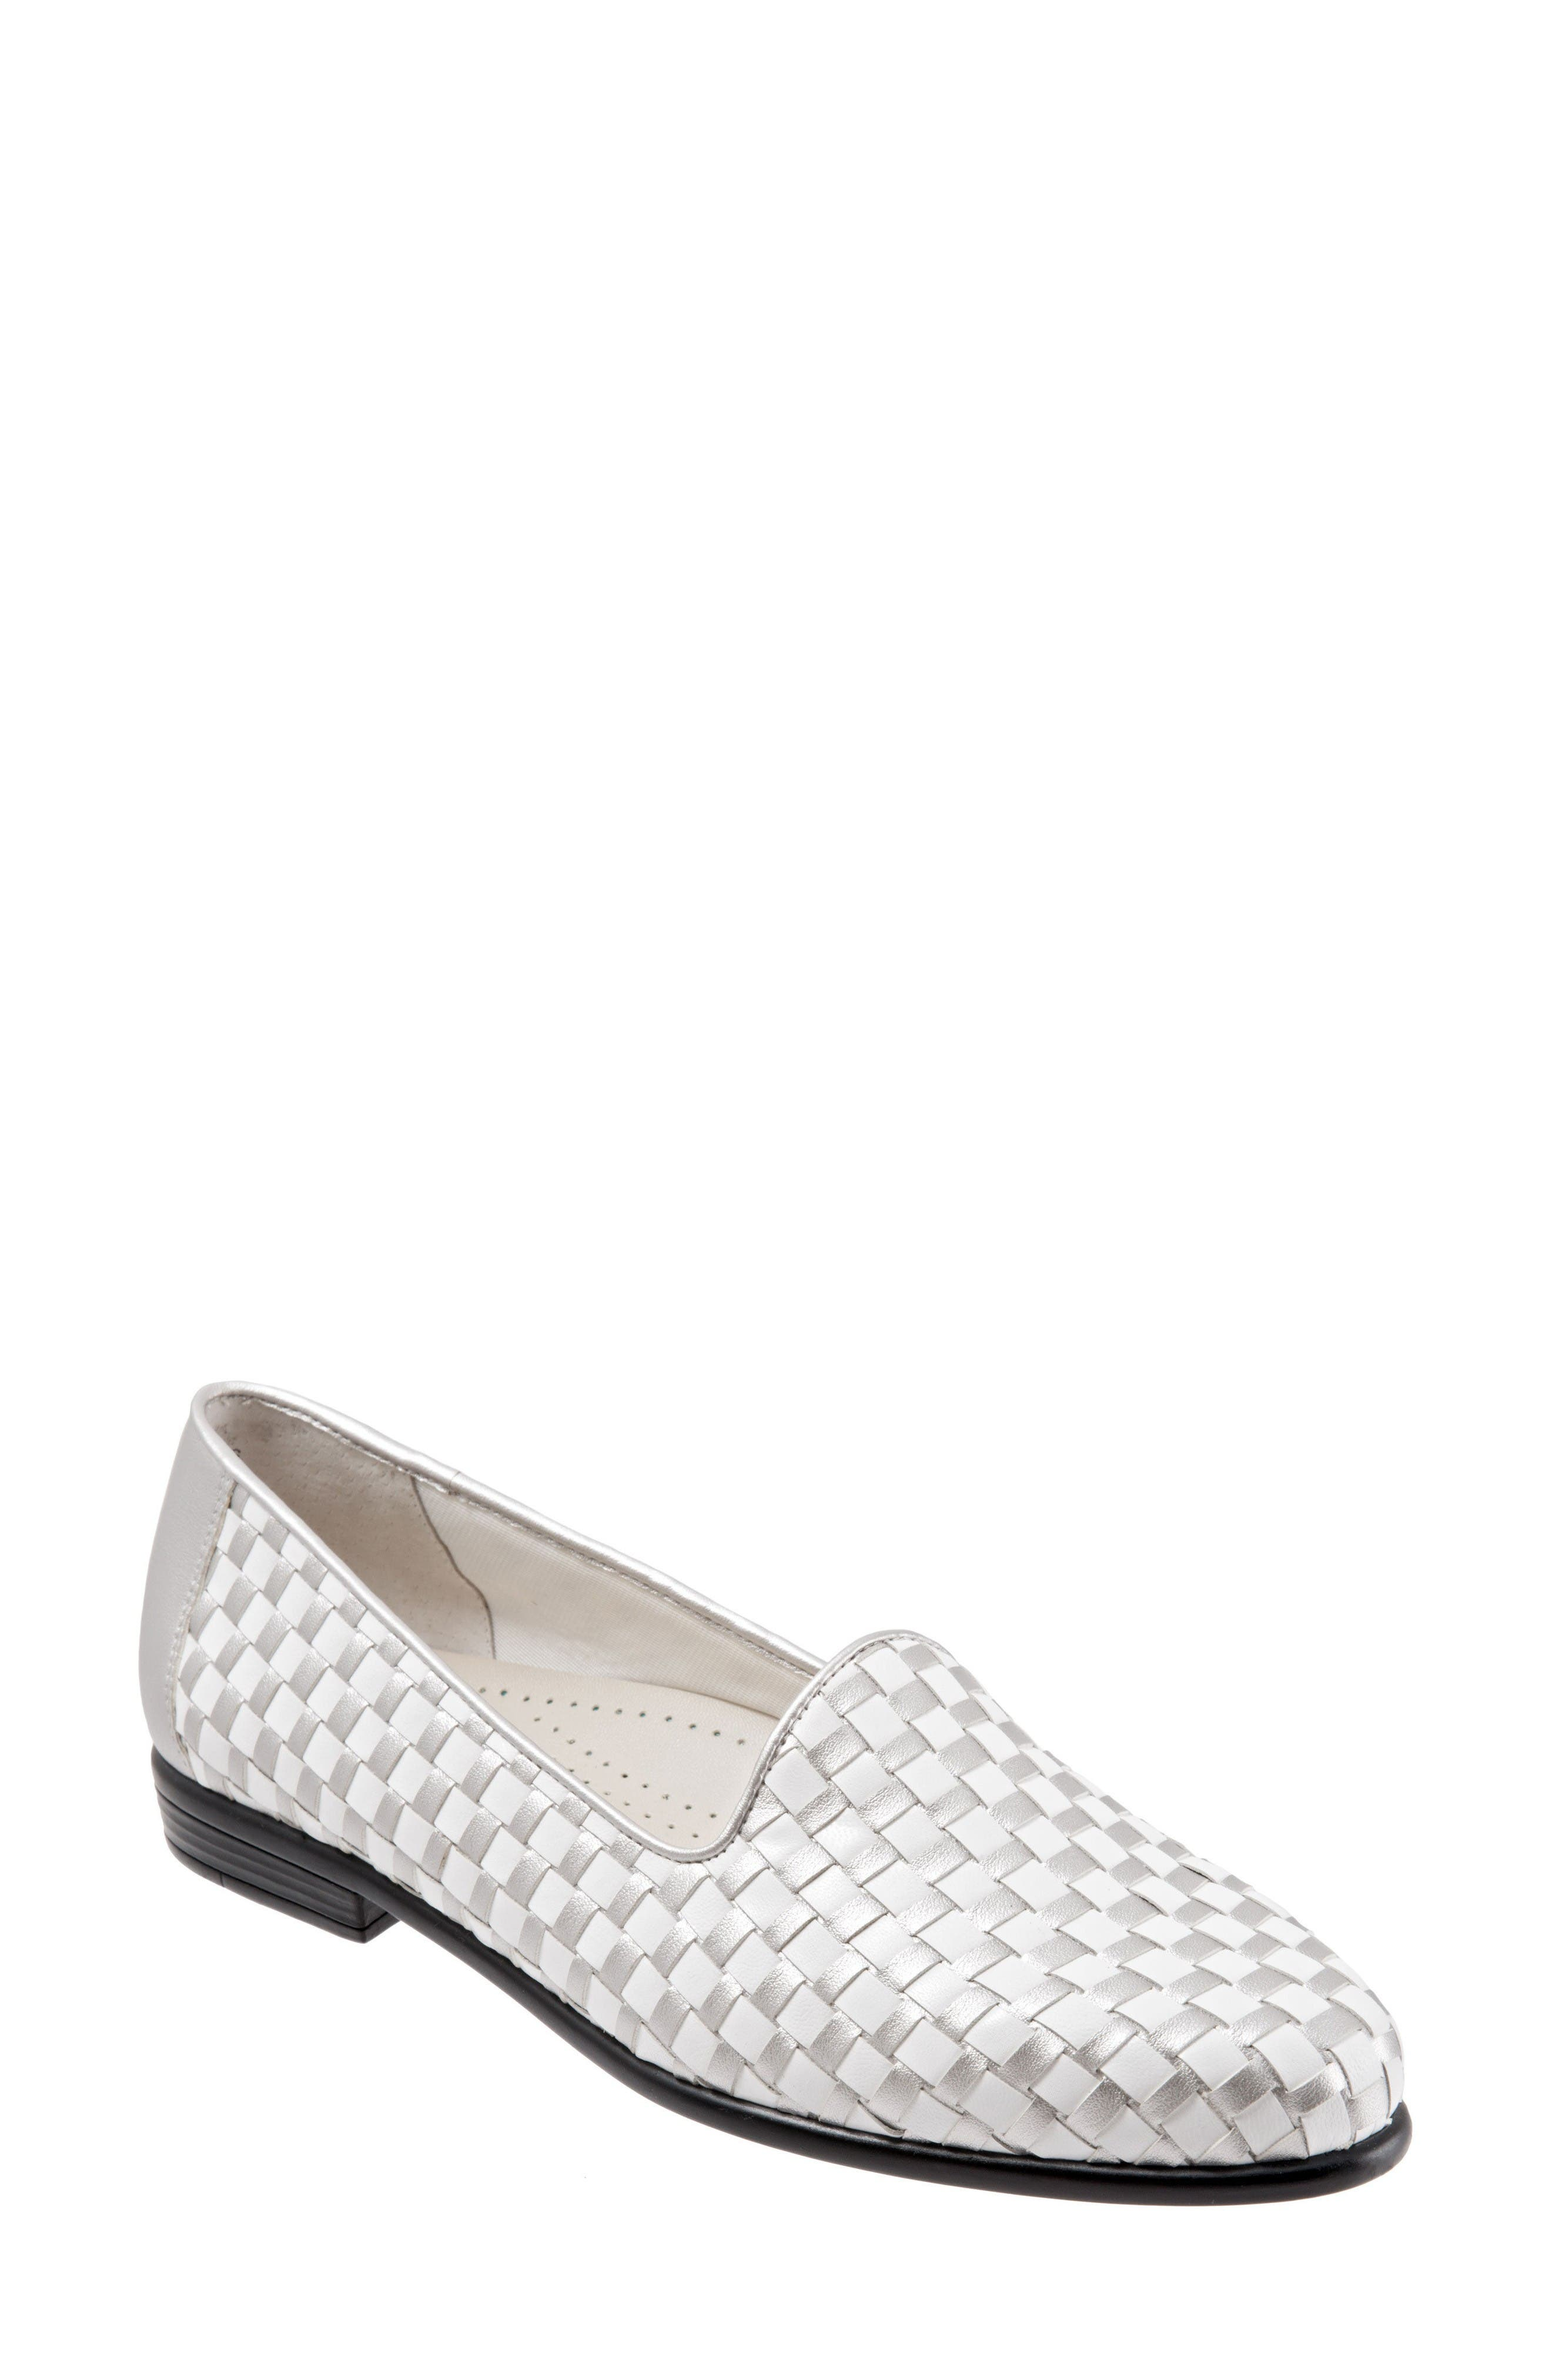 Alternate Image 1 Selected - Trotters Liz Woven Loafer Flat (Women)